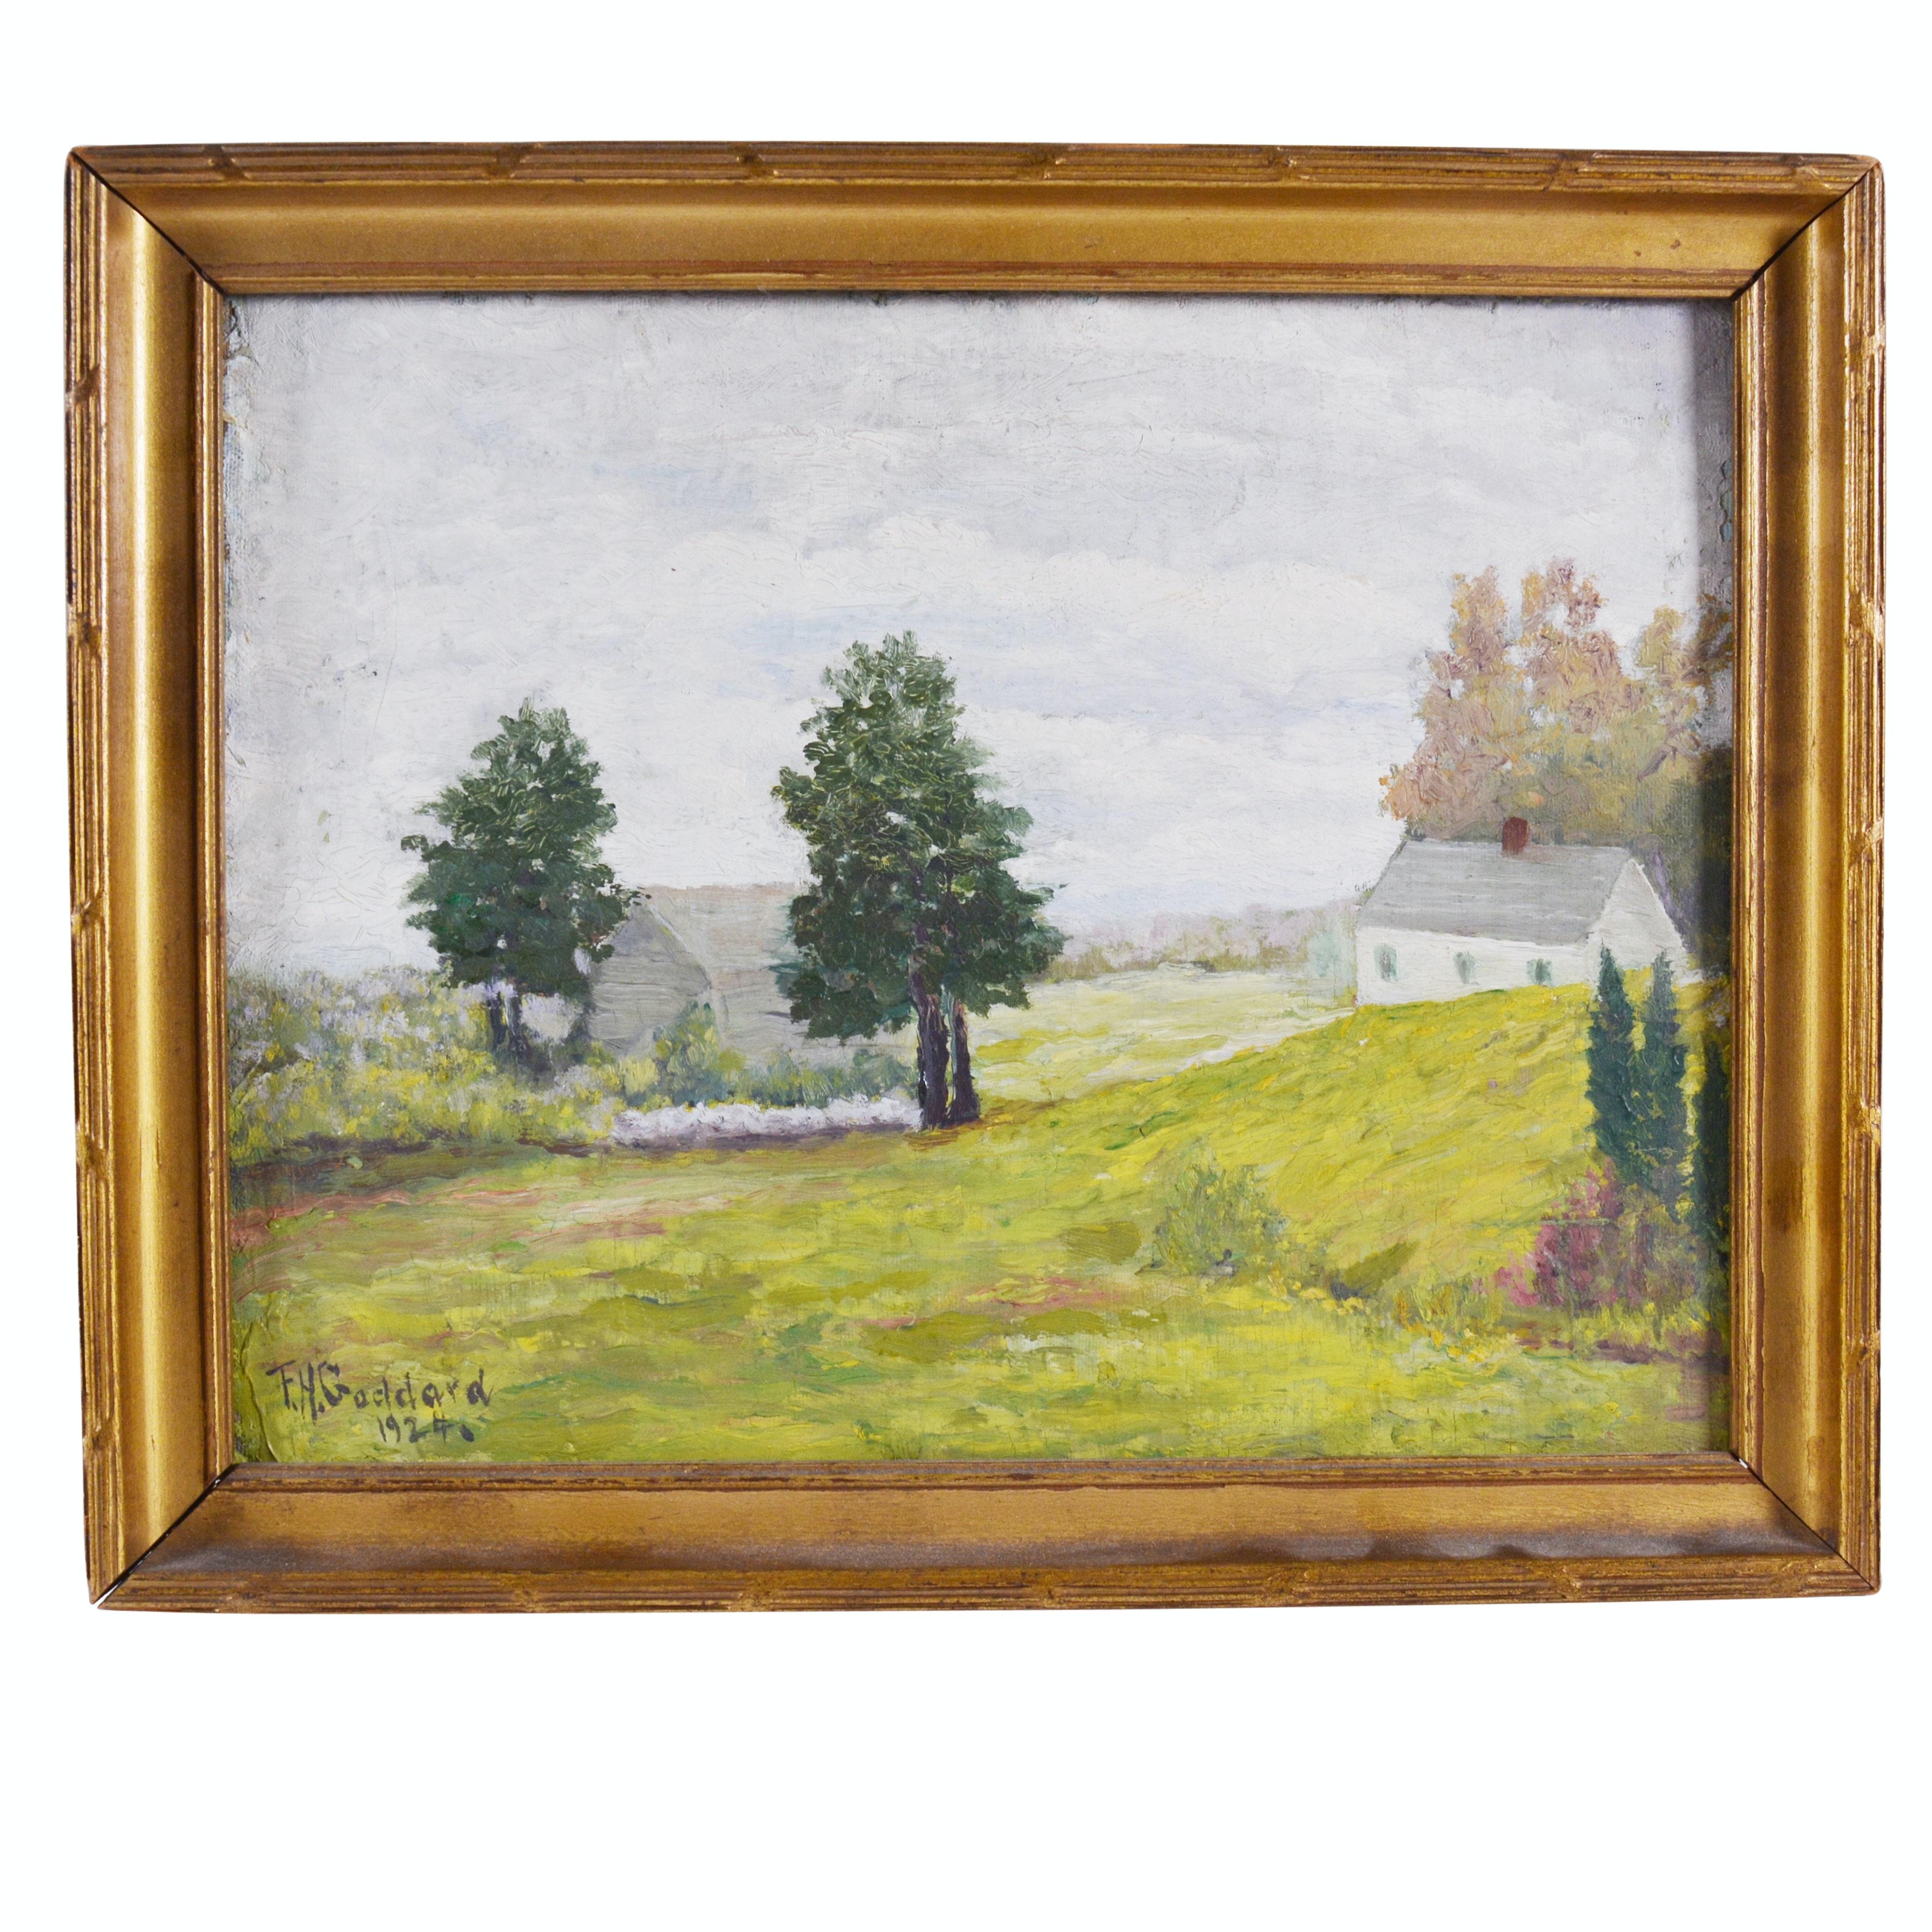 F.H. Goddard Oil Painting of Landscape